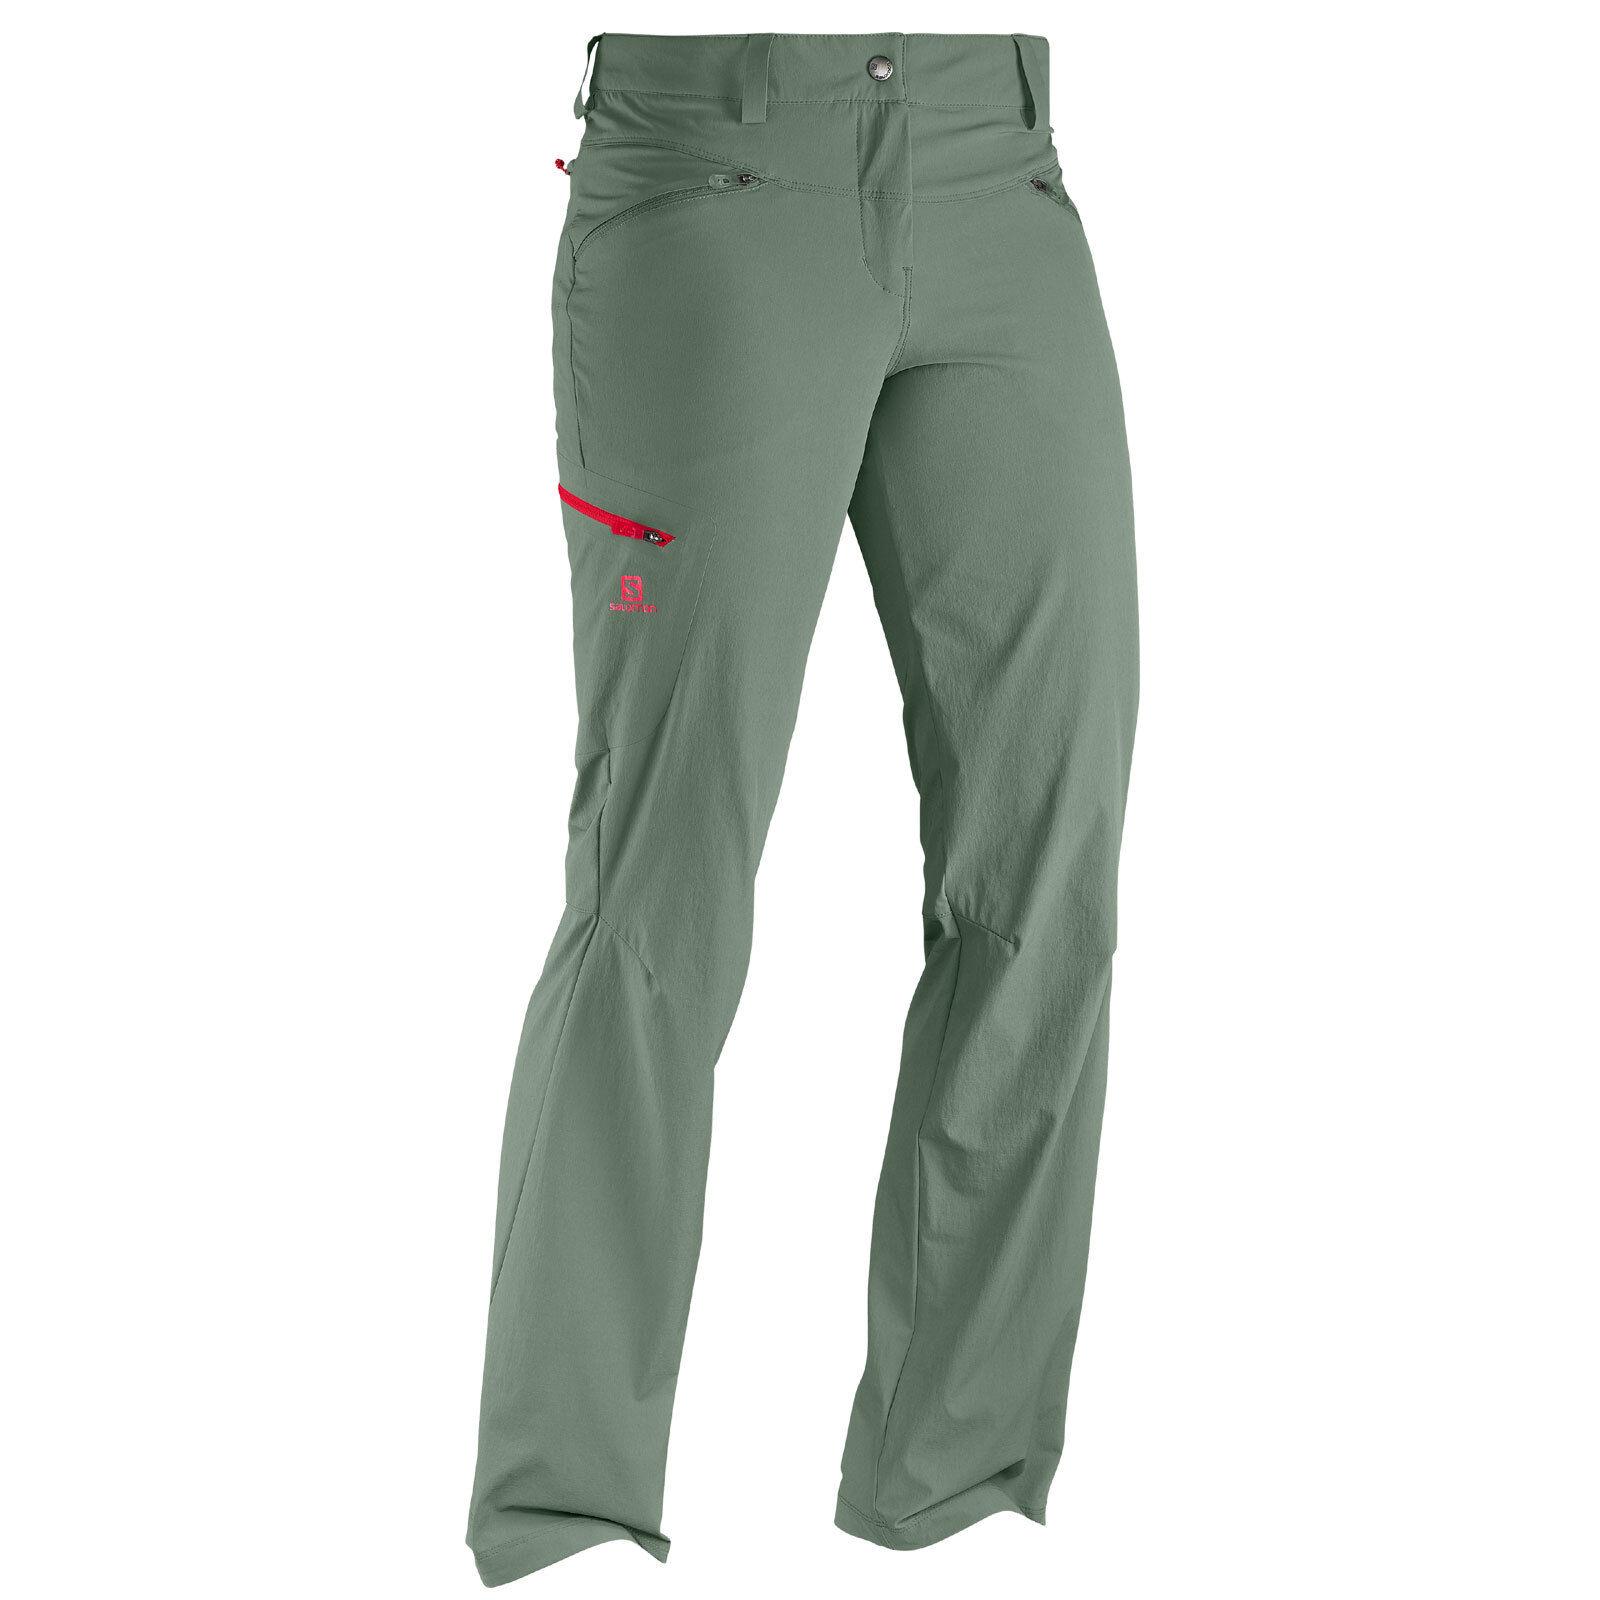 Salomon Wayfarer Pant Pant Pant damen Hiking Outdoor Trousers Functional 8cfb2e